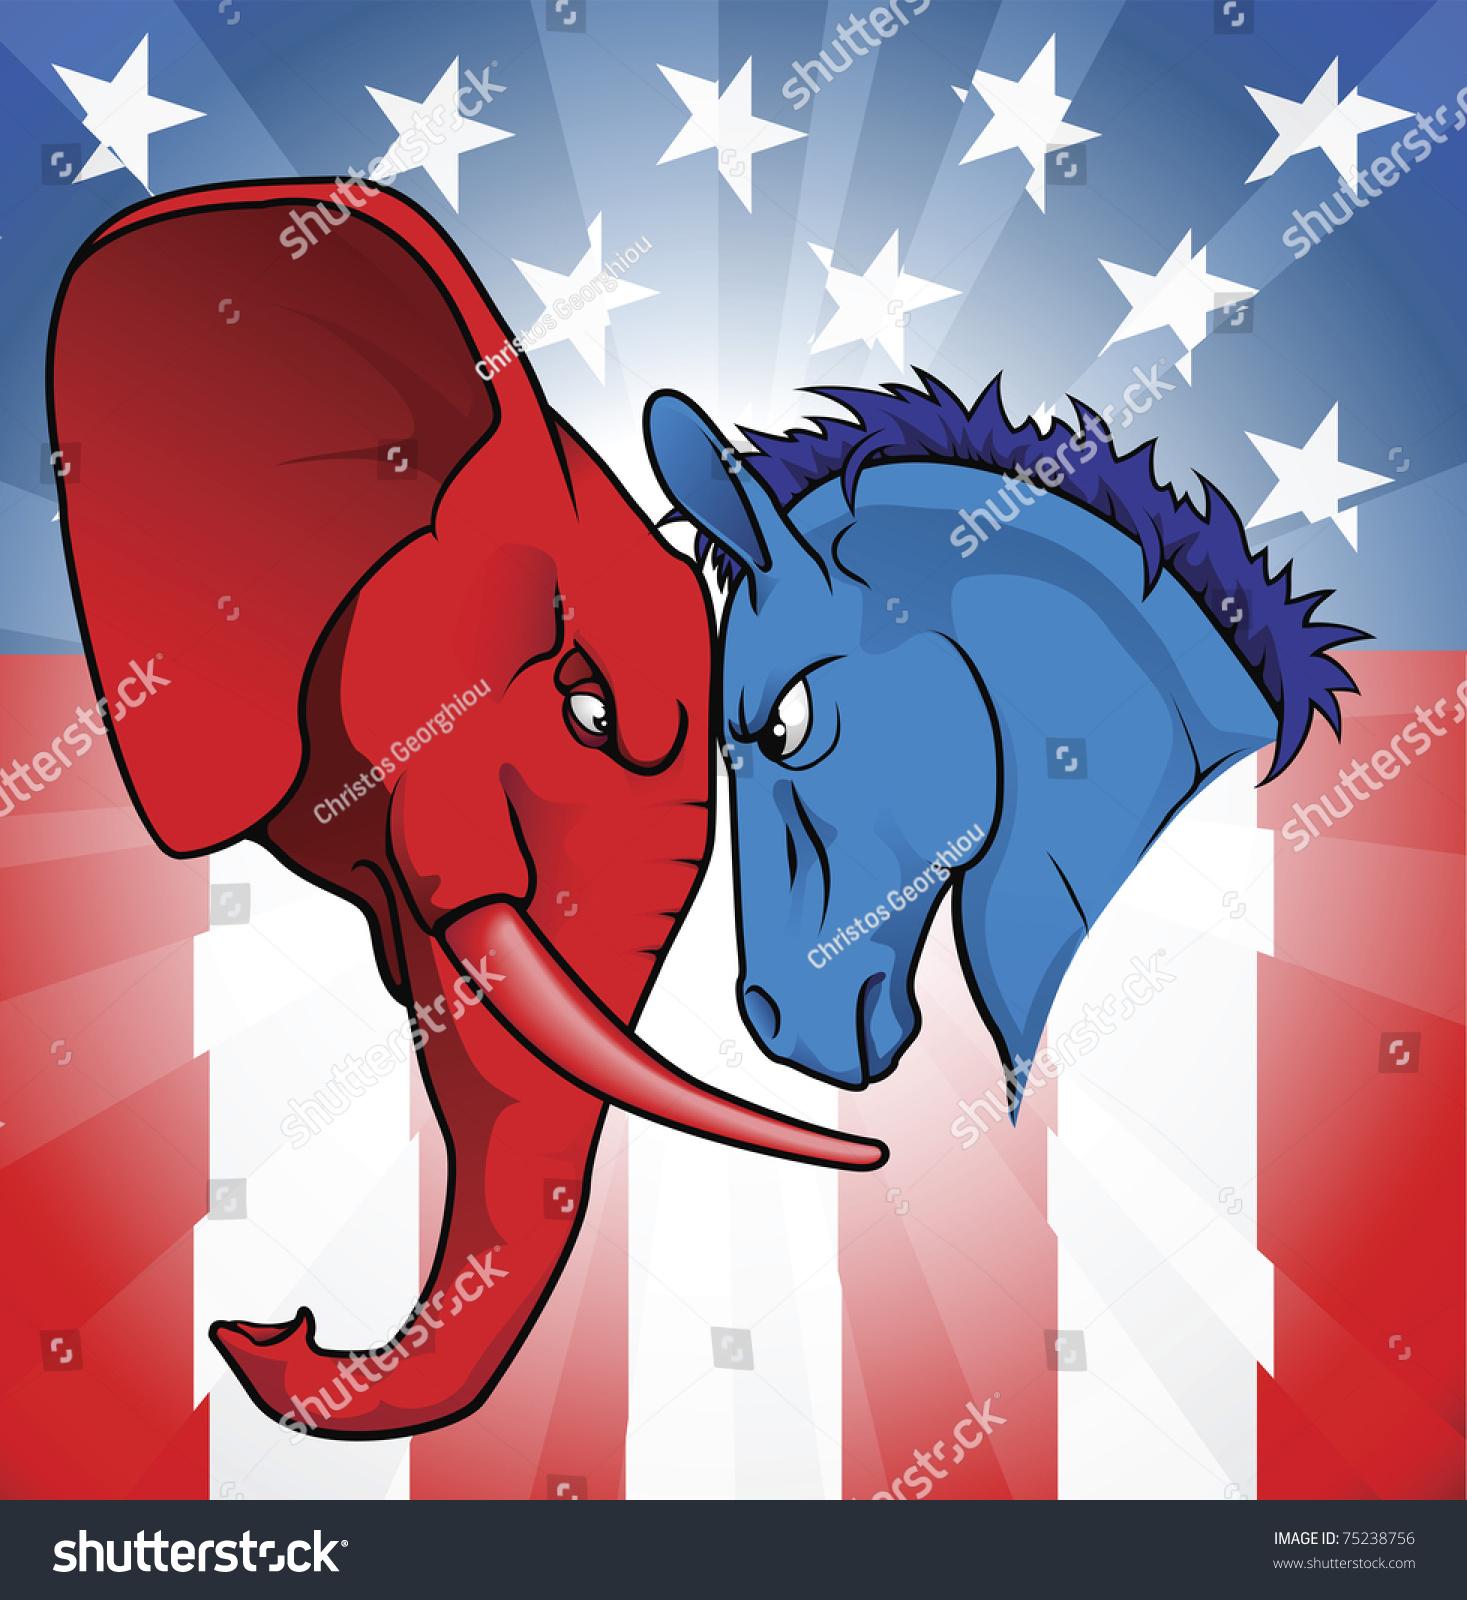 Democrat republican symbols donkey elephant facing stock vector the democrat and republican symbols of a donkey and elephant facing off biocorpaavc Images